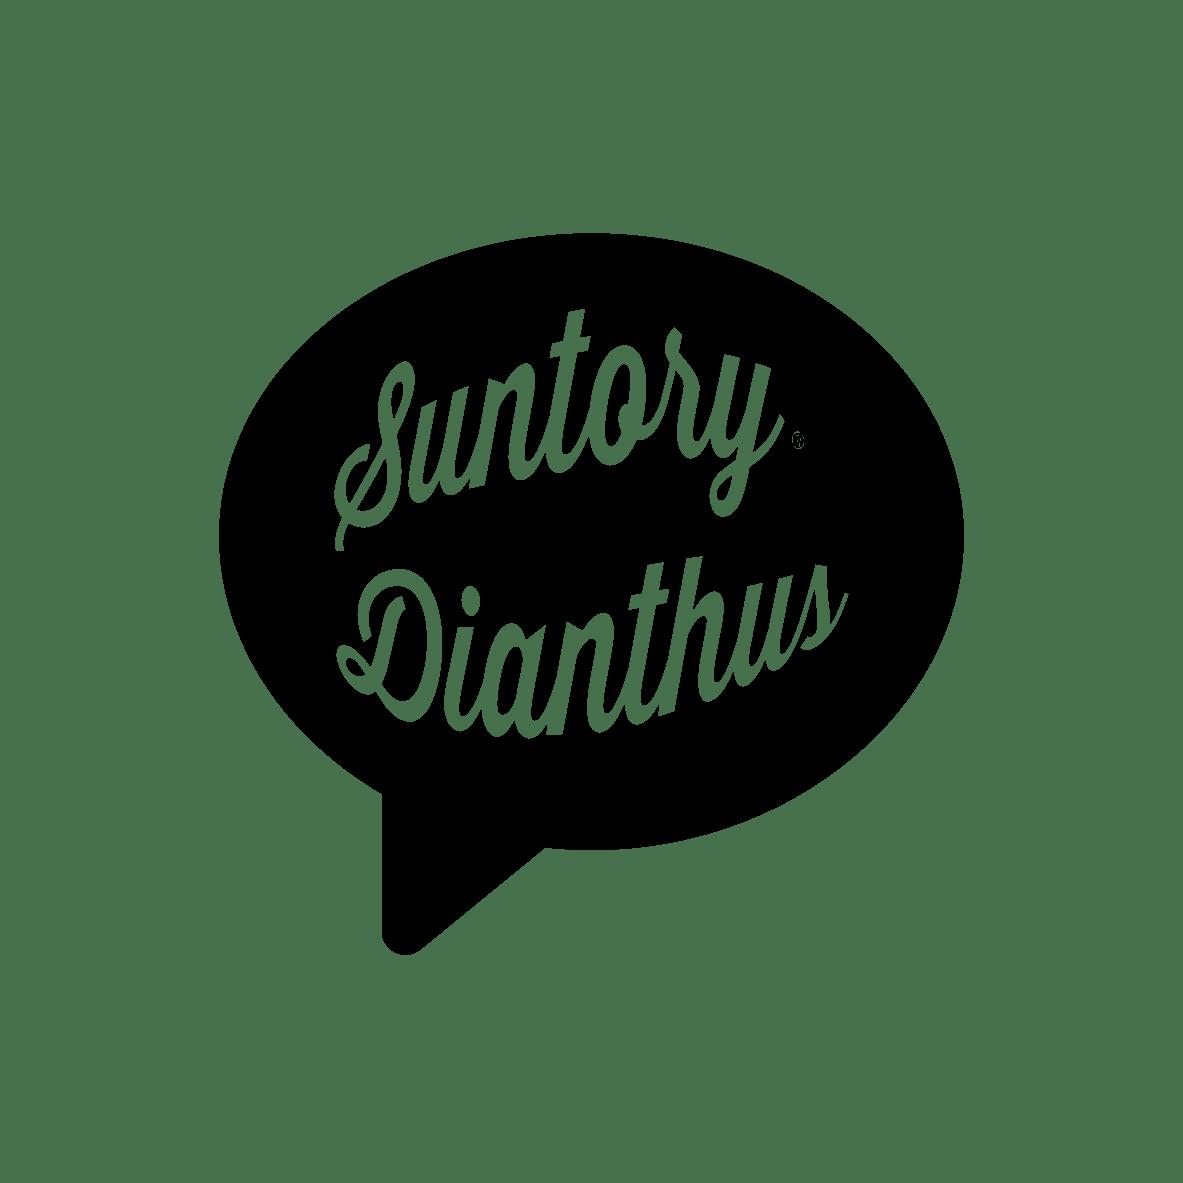 Suntory Dianthus logo black